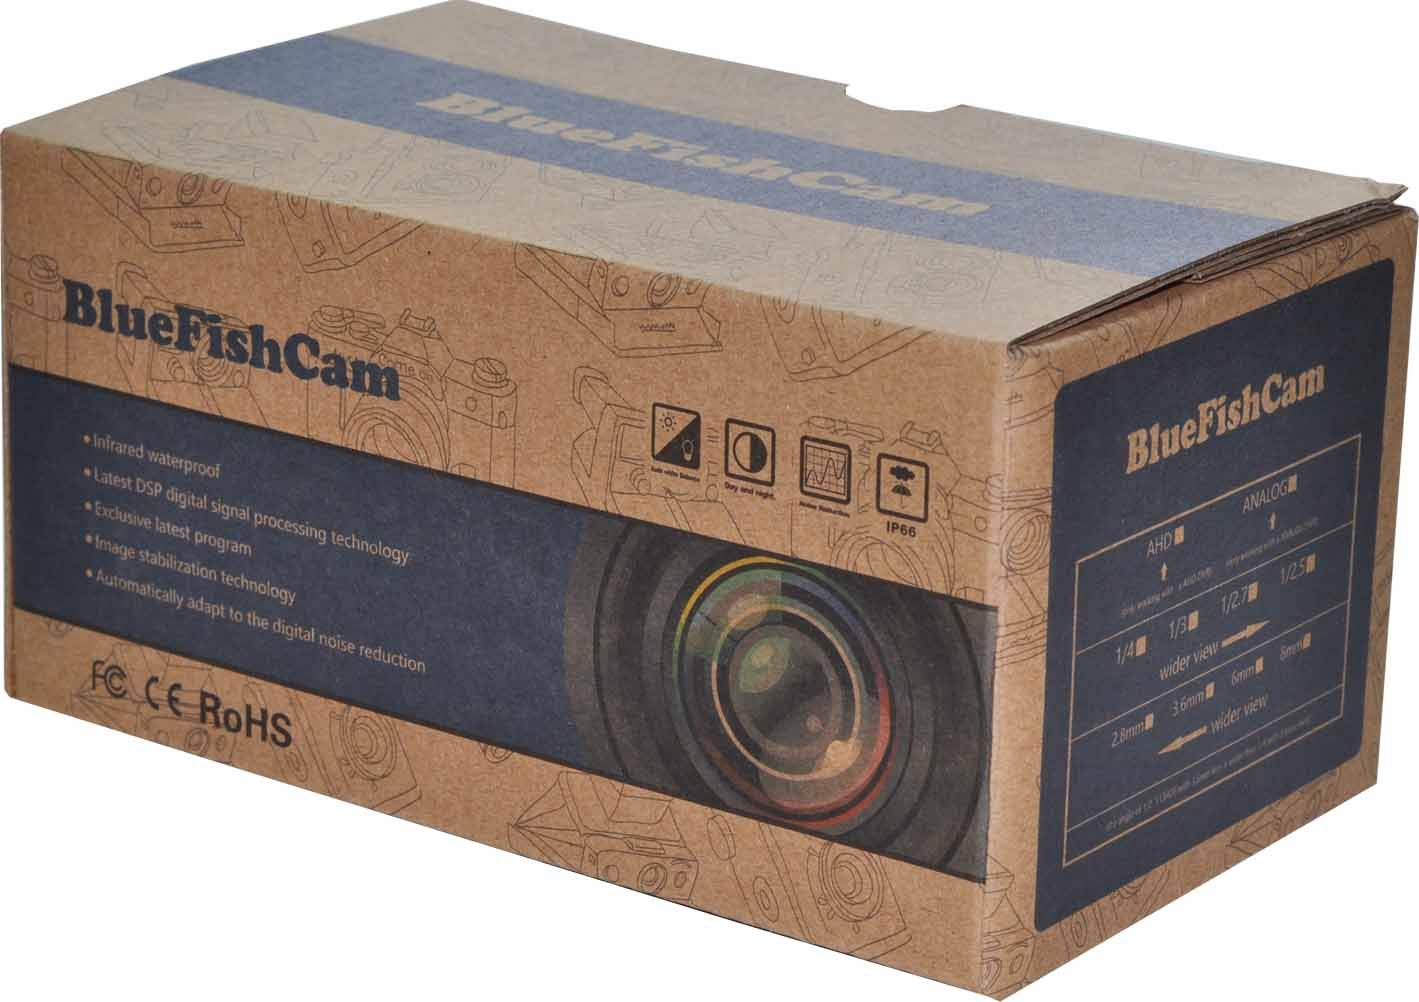 BlueFishCam Lens 3.6mm Cmos 800TVL CCTV Camera 36 LEDs Infrared Waterproof with IR-Cut Color Analog Security Camera 864173